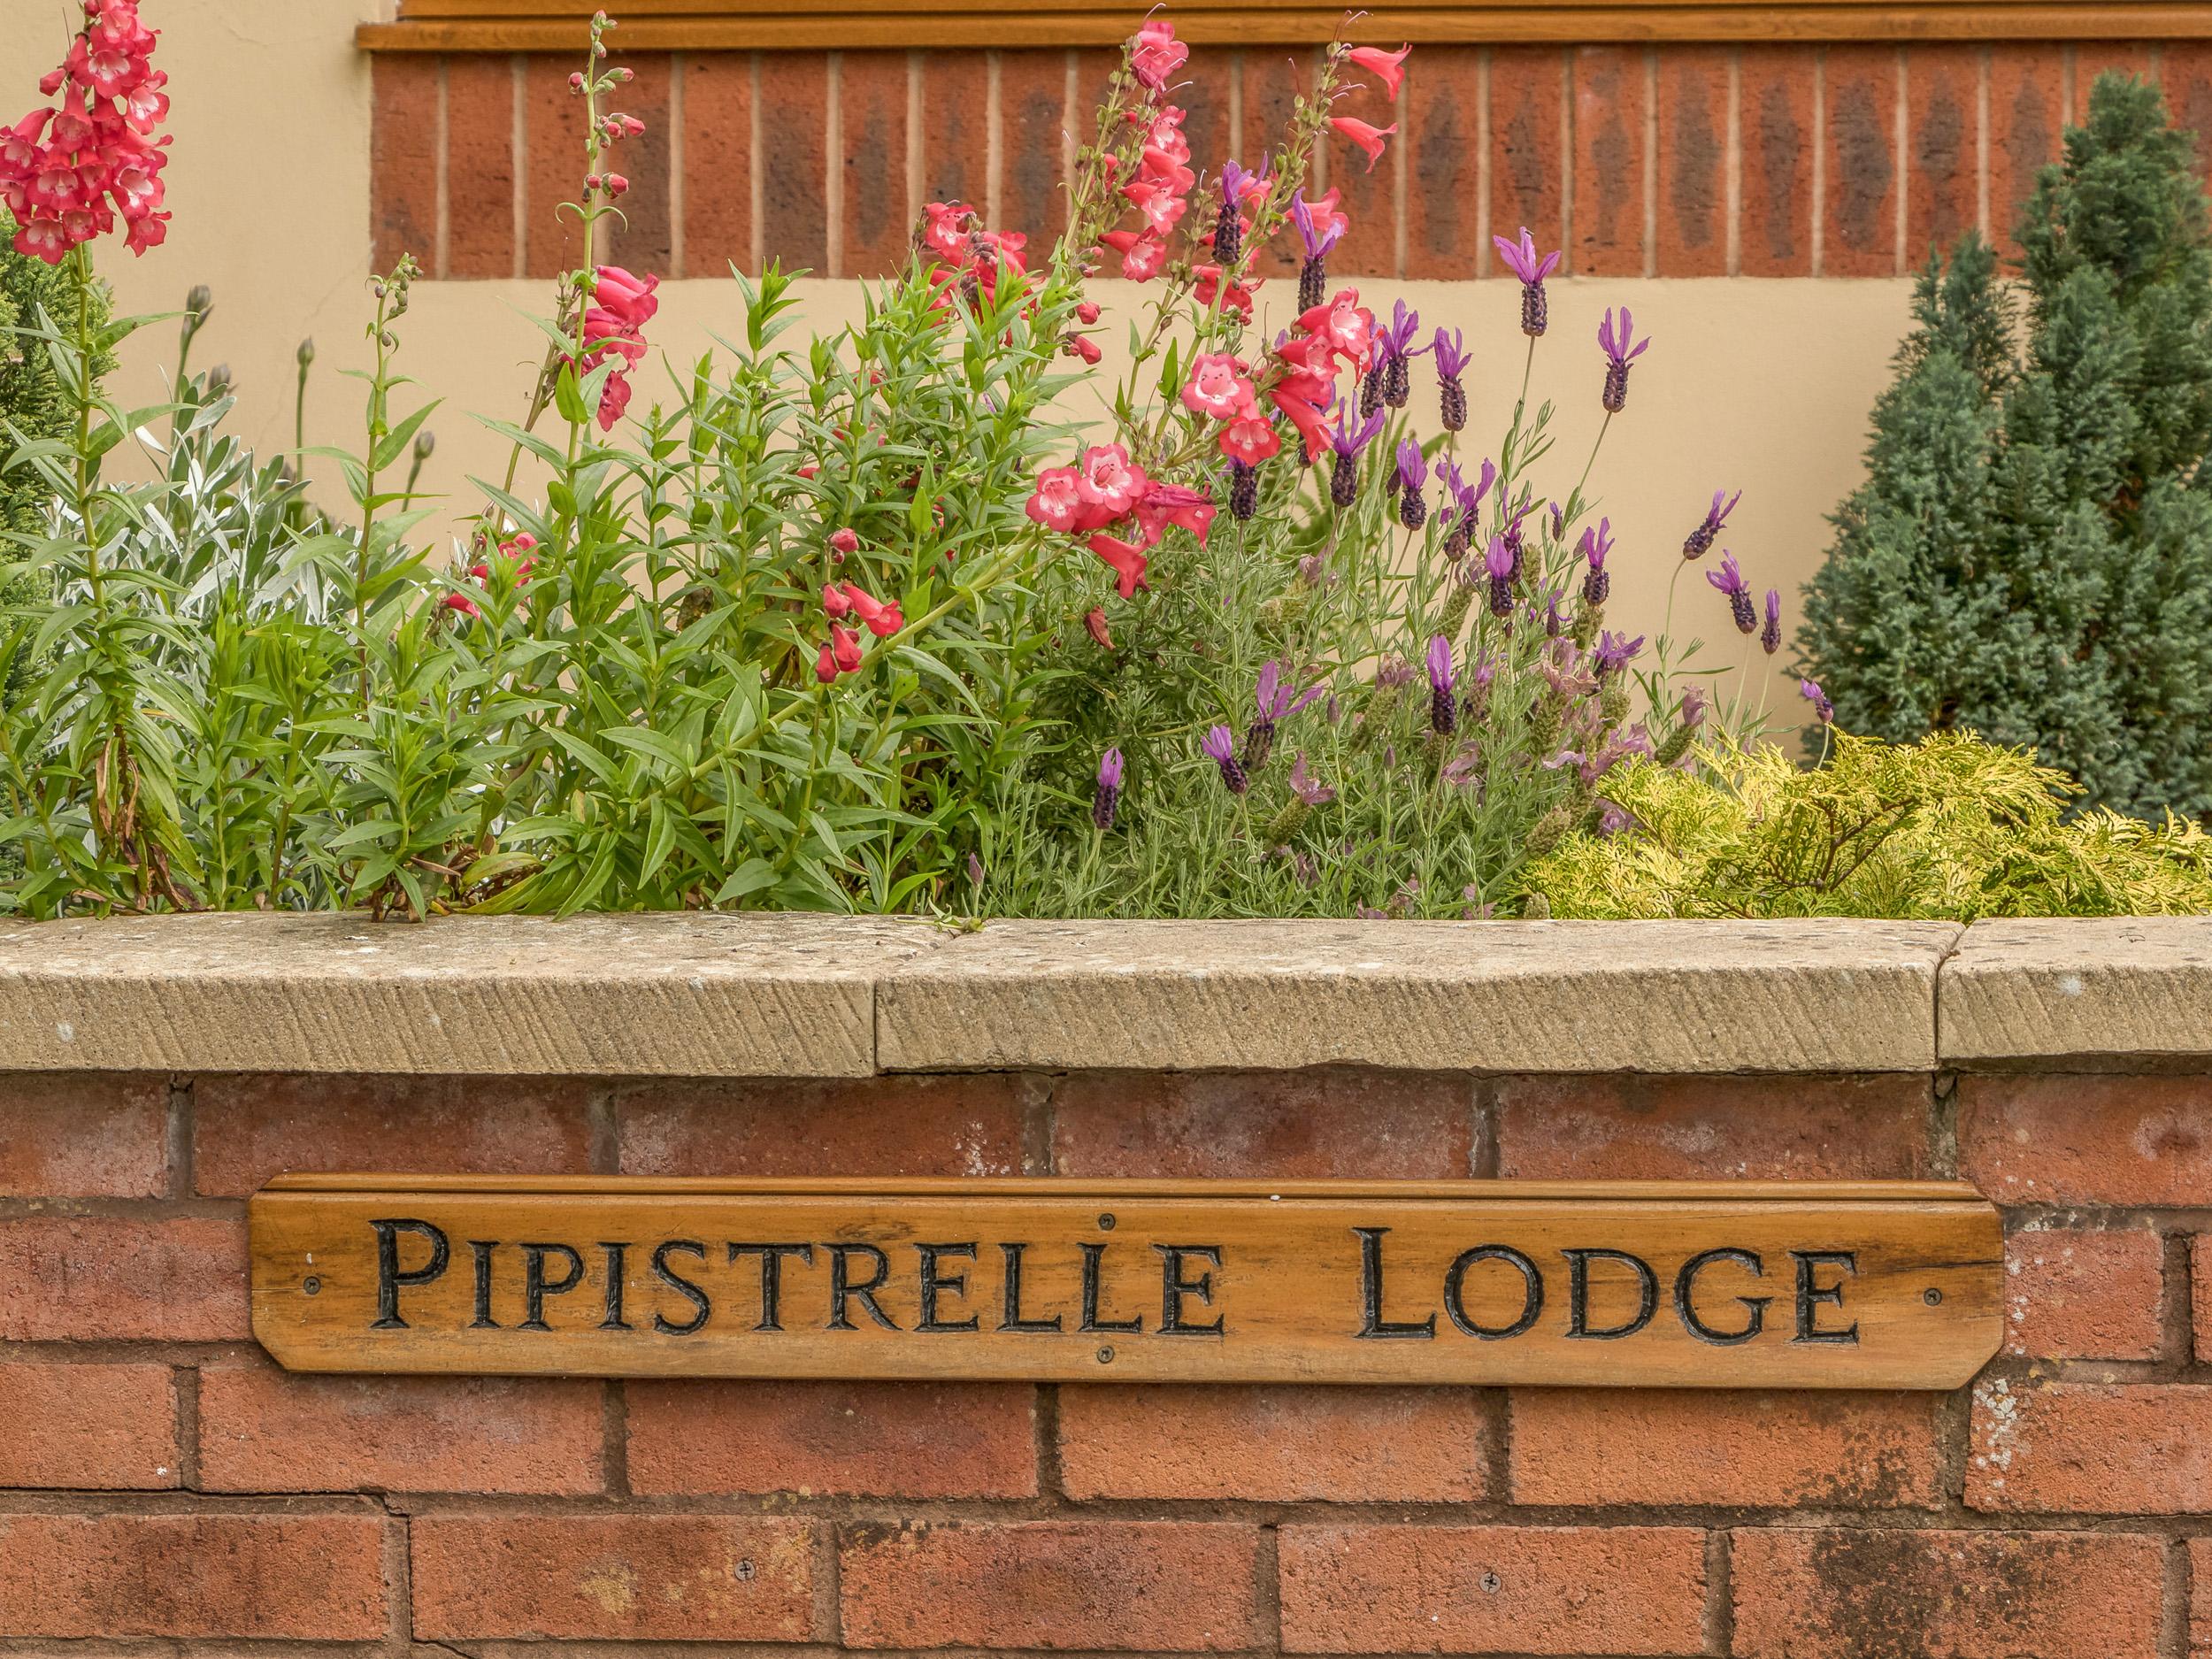 Pipistrelle Lodge